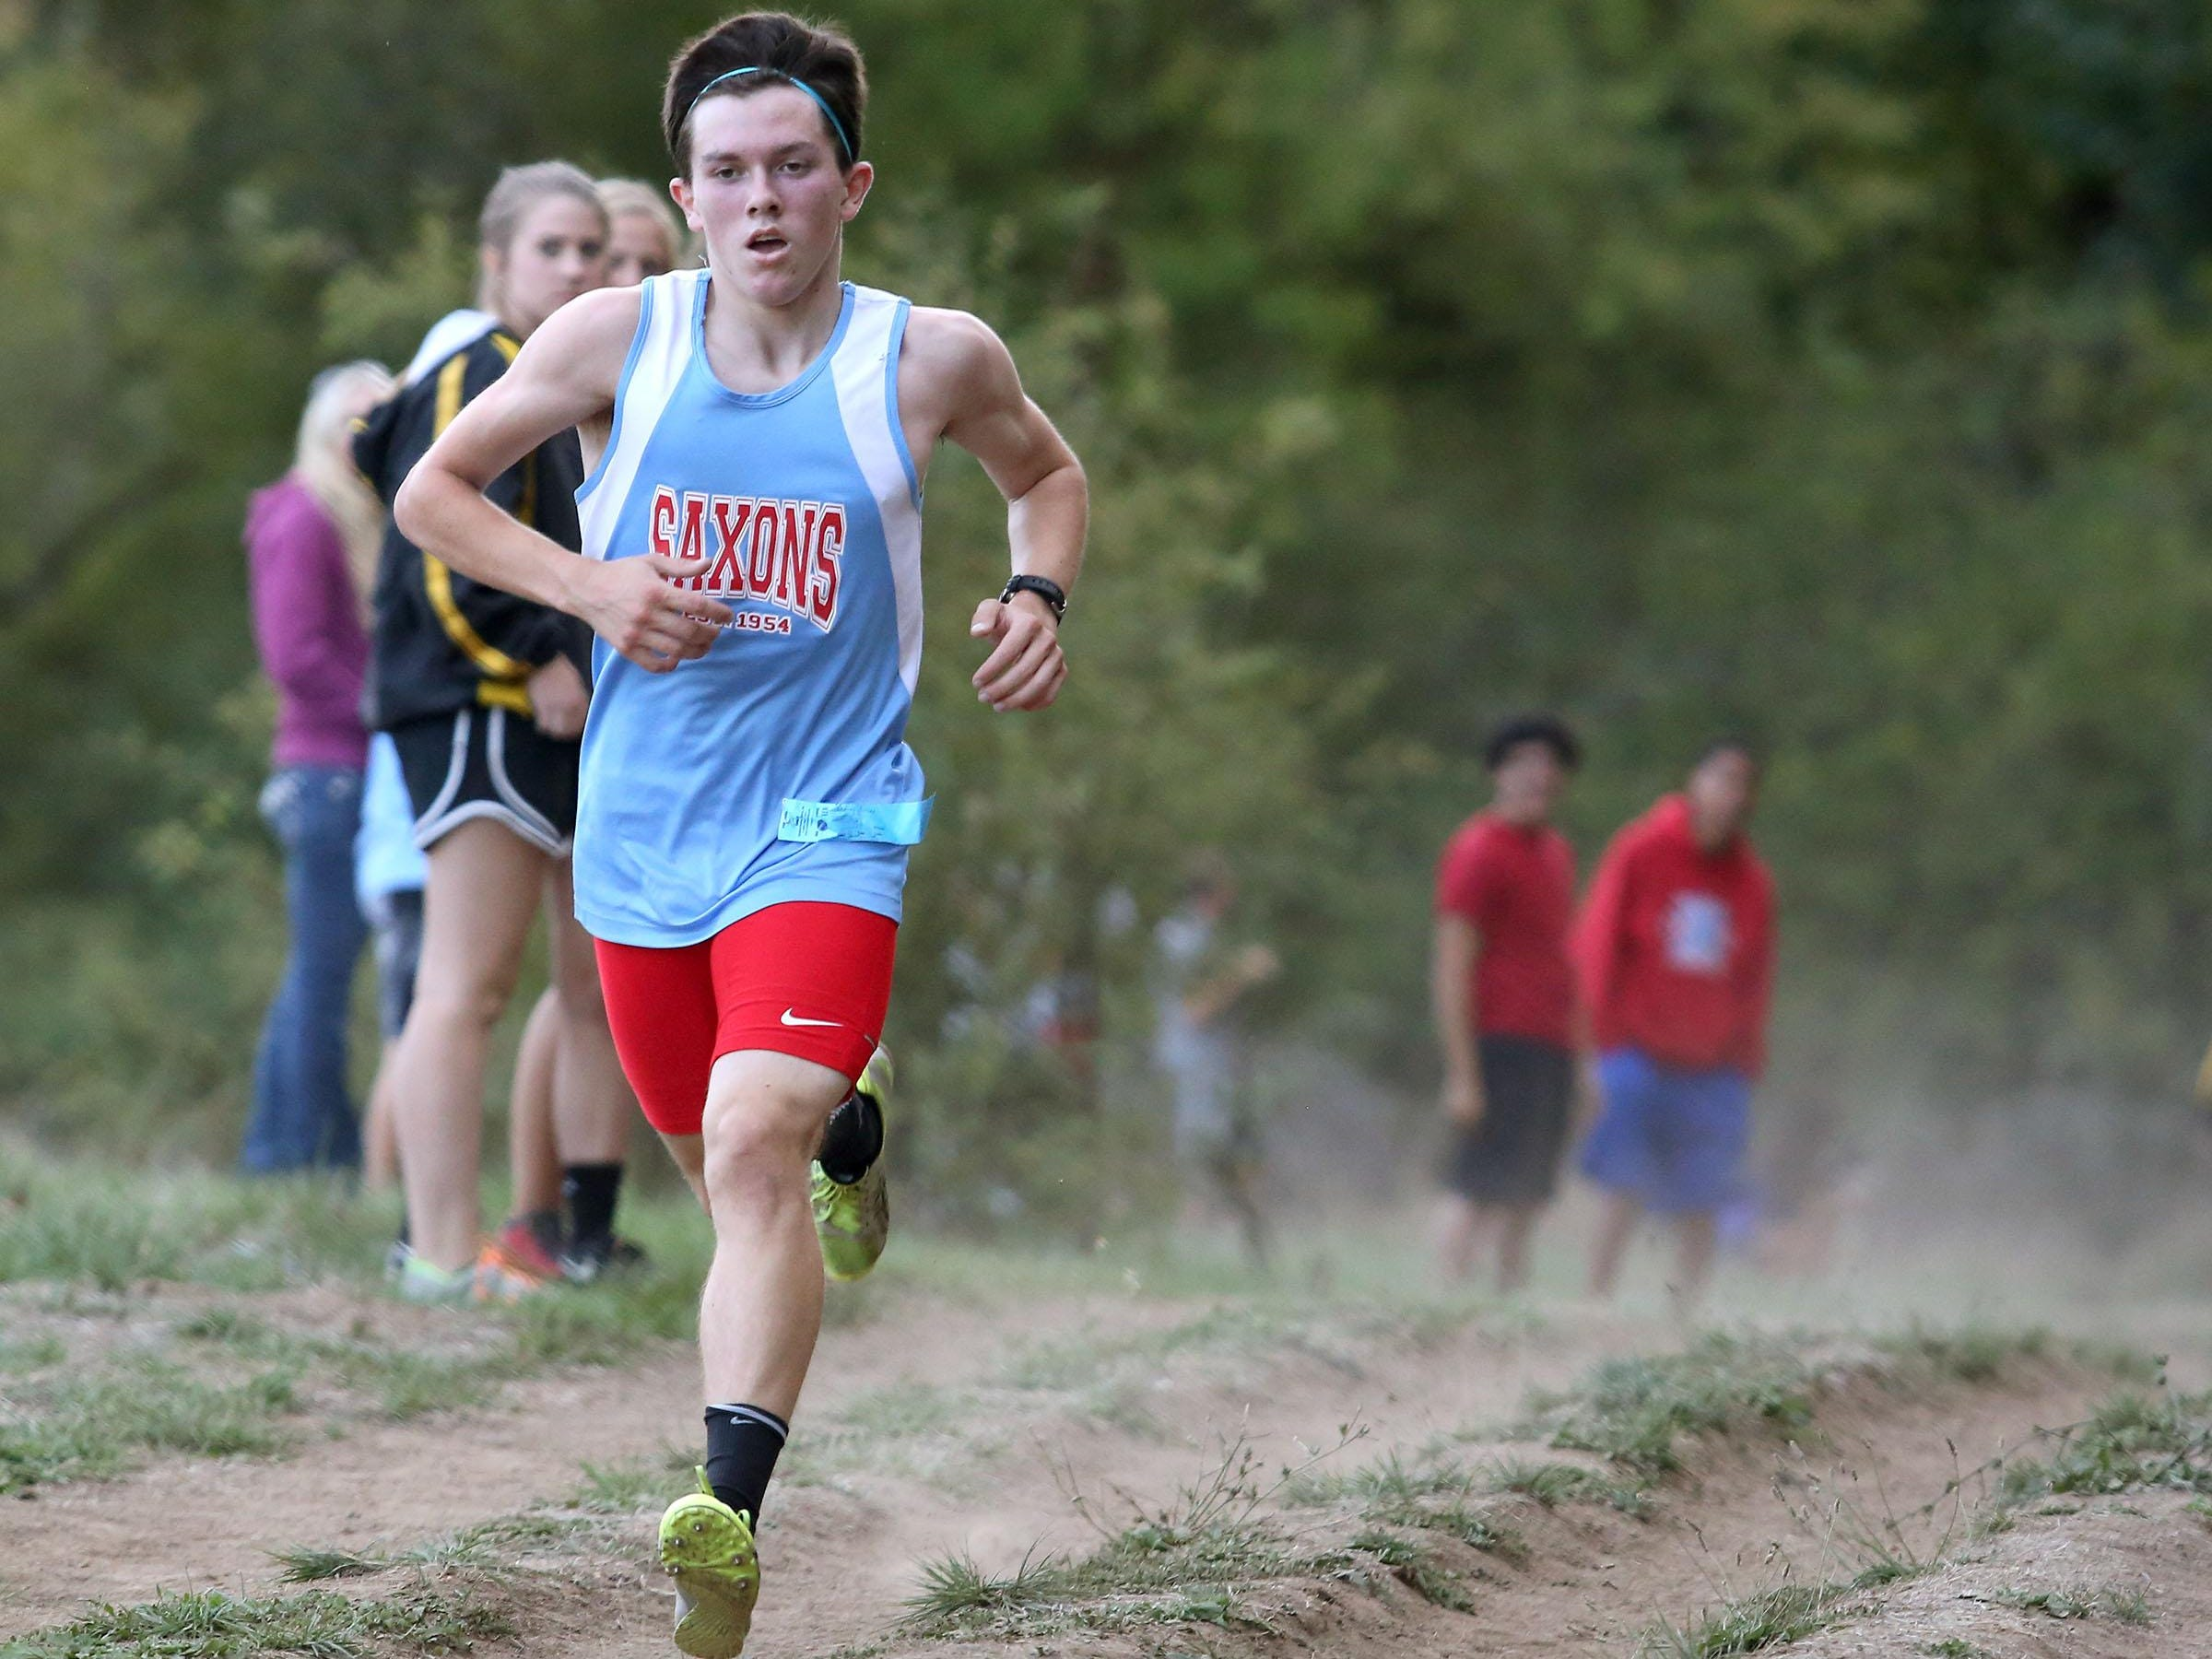 South Salem High School's Thomas Burney won the boys race at the Stayton XC Invitational at Willamette Mission State Park on Wednesday, Sept. 23, 2015, Salem, Ore.